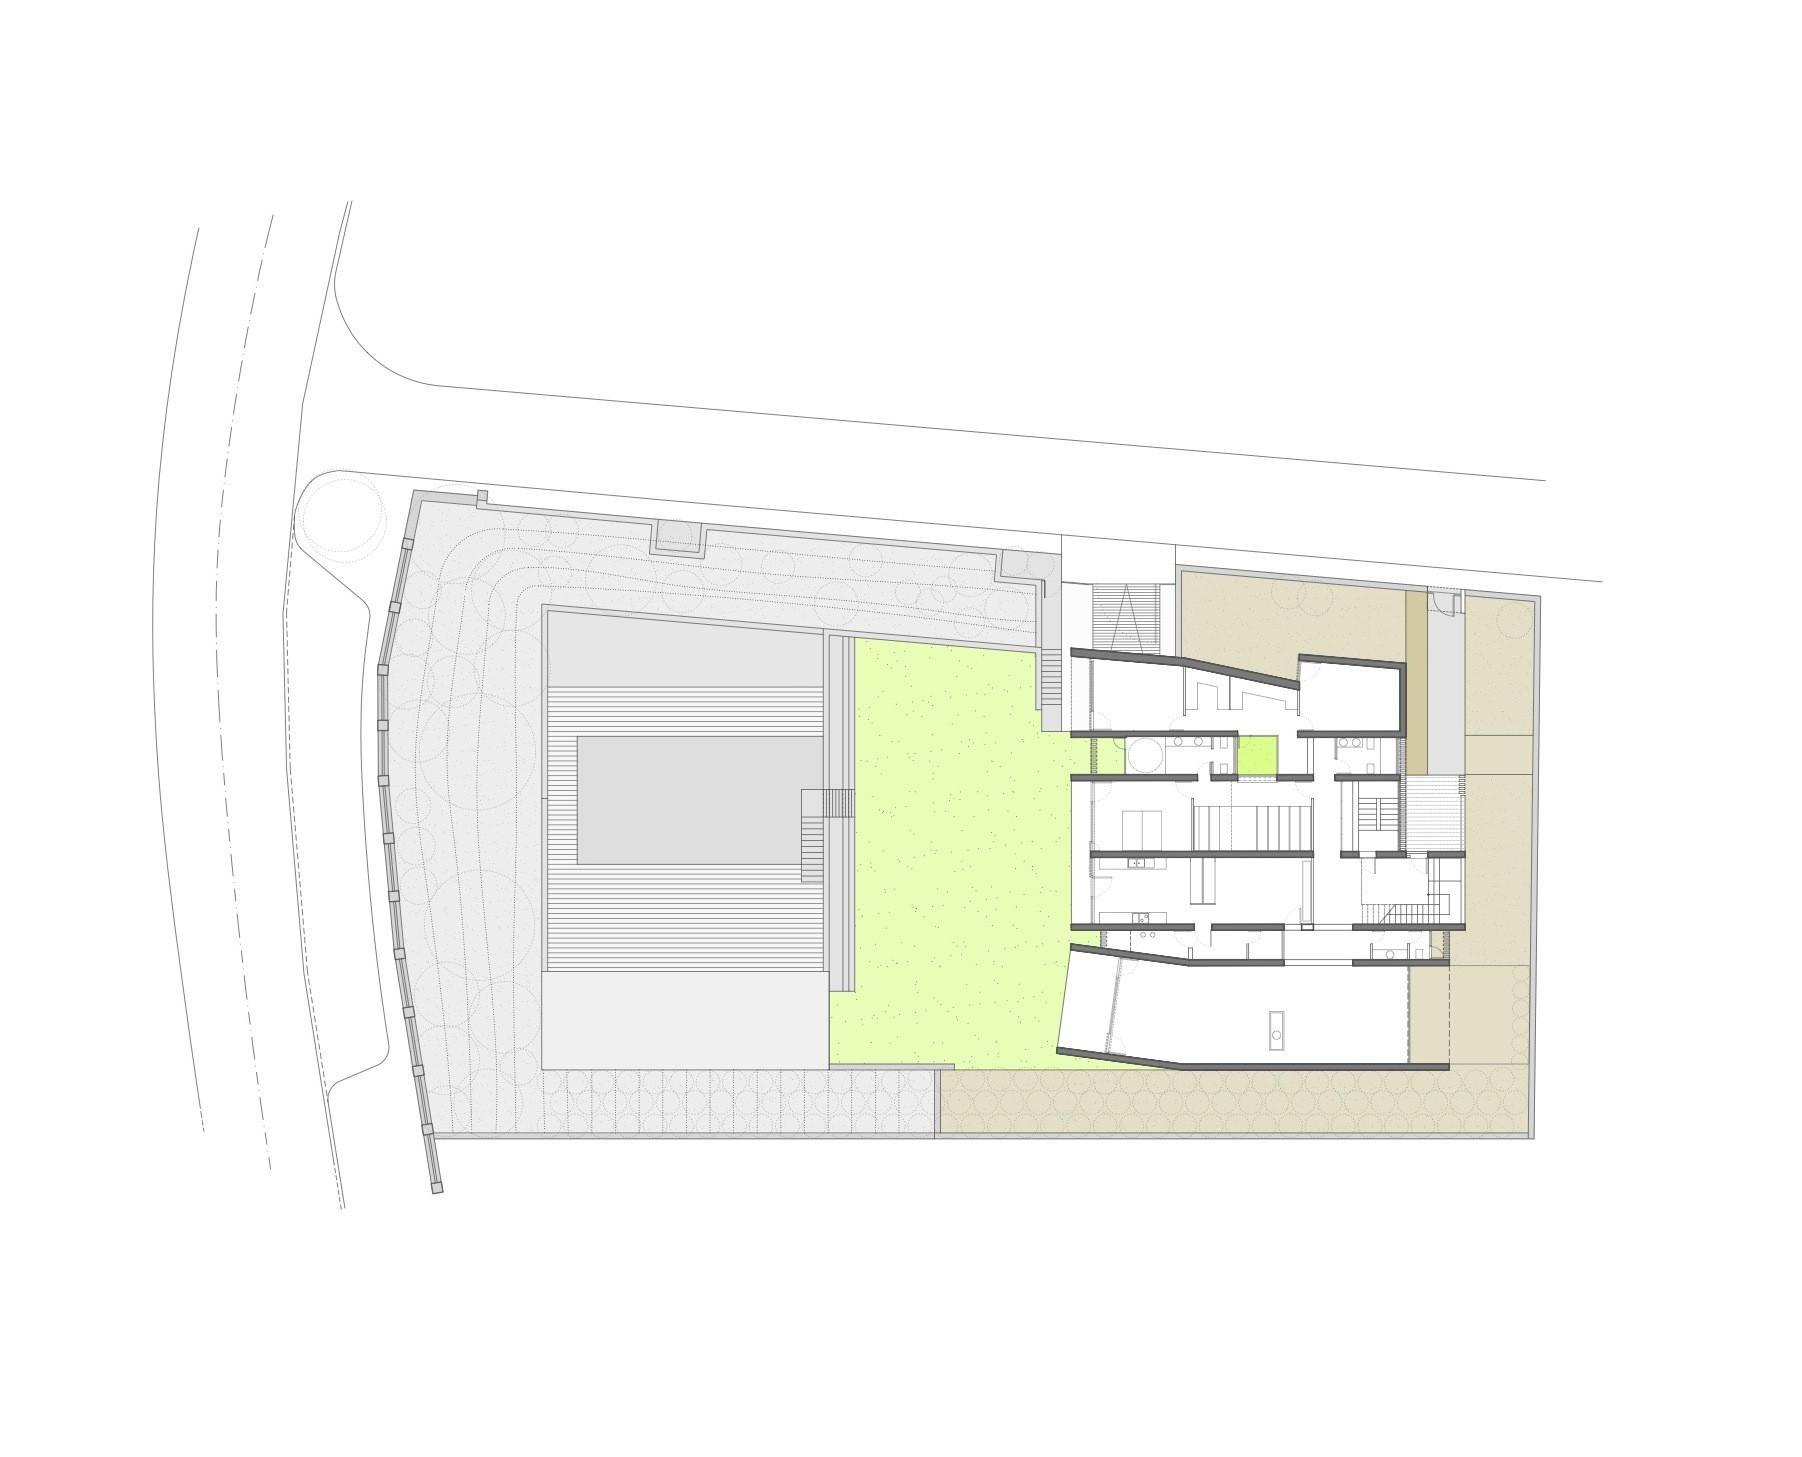 Gallery of Z House / Jose Antonio Sosa - 17 on floating dock plans, vardo camper plans, new house design plans, biltmore estate elevation plans,